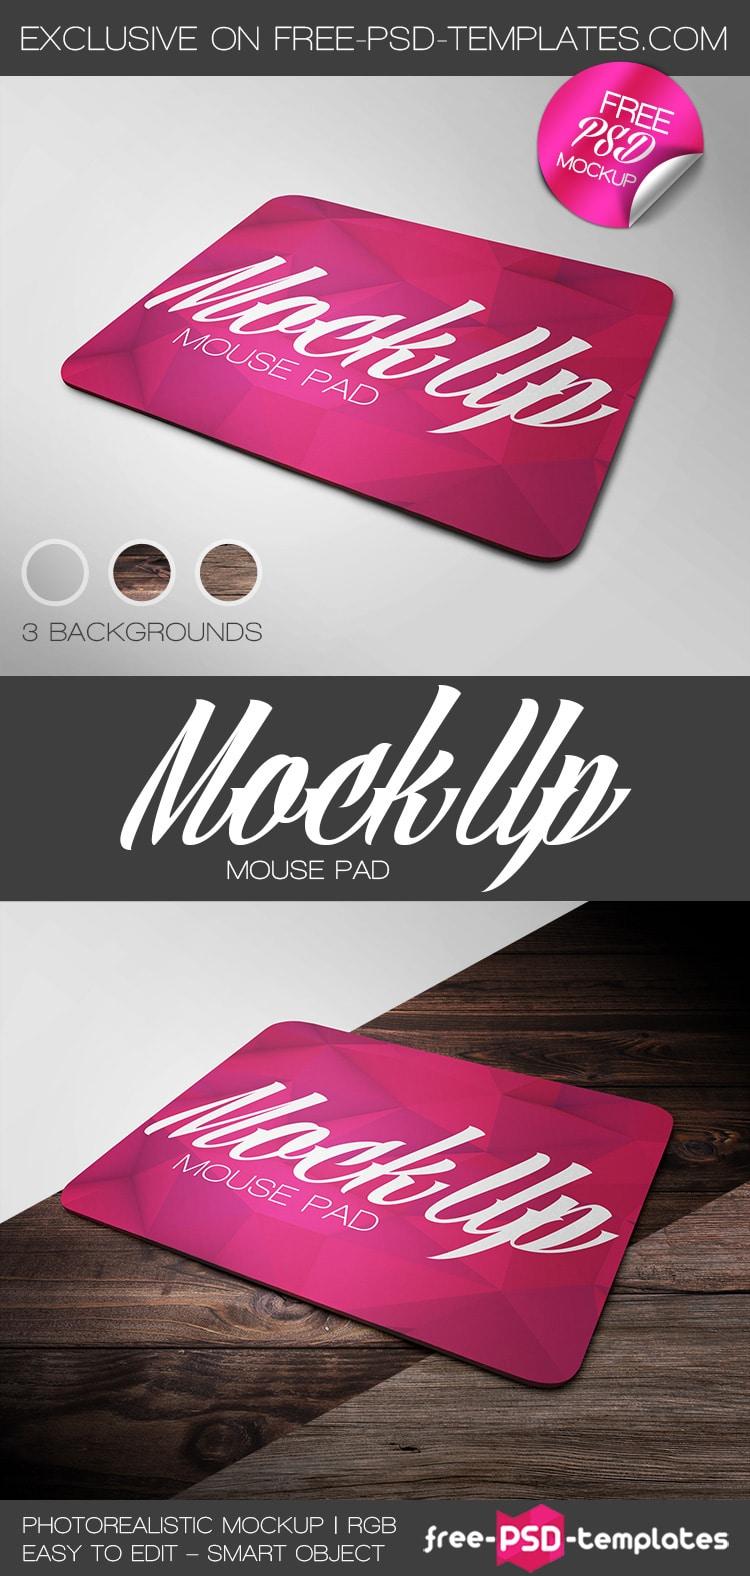 Customizable Mousepad Mockup